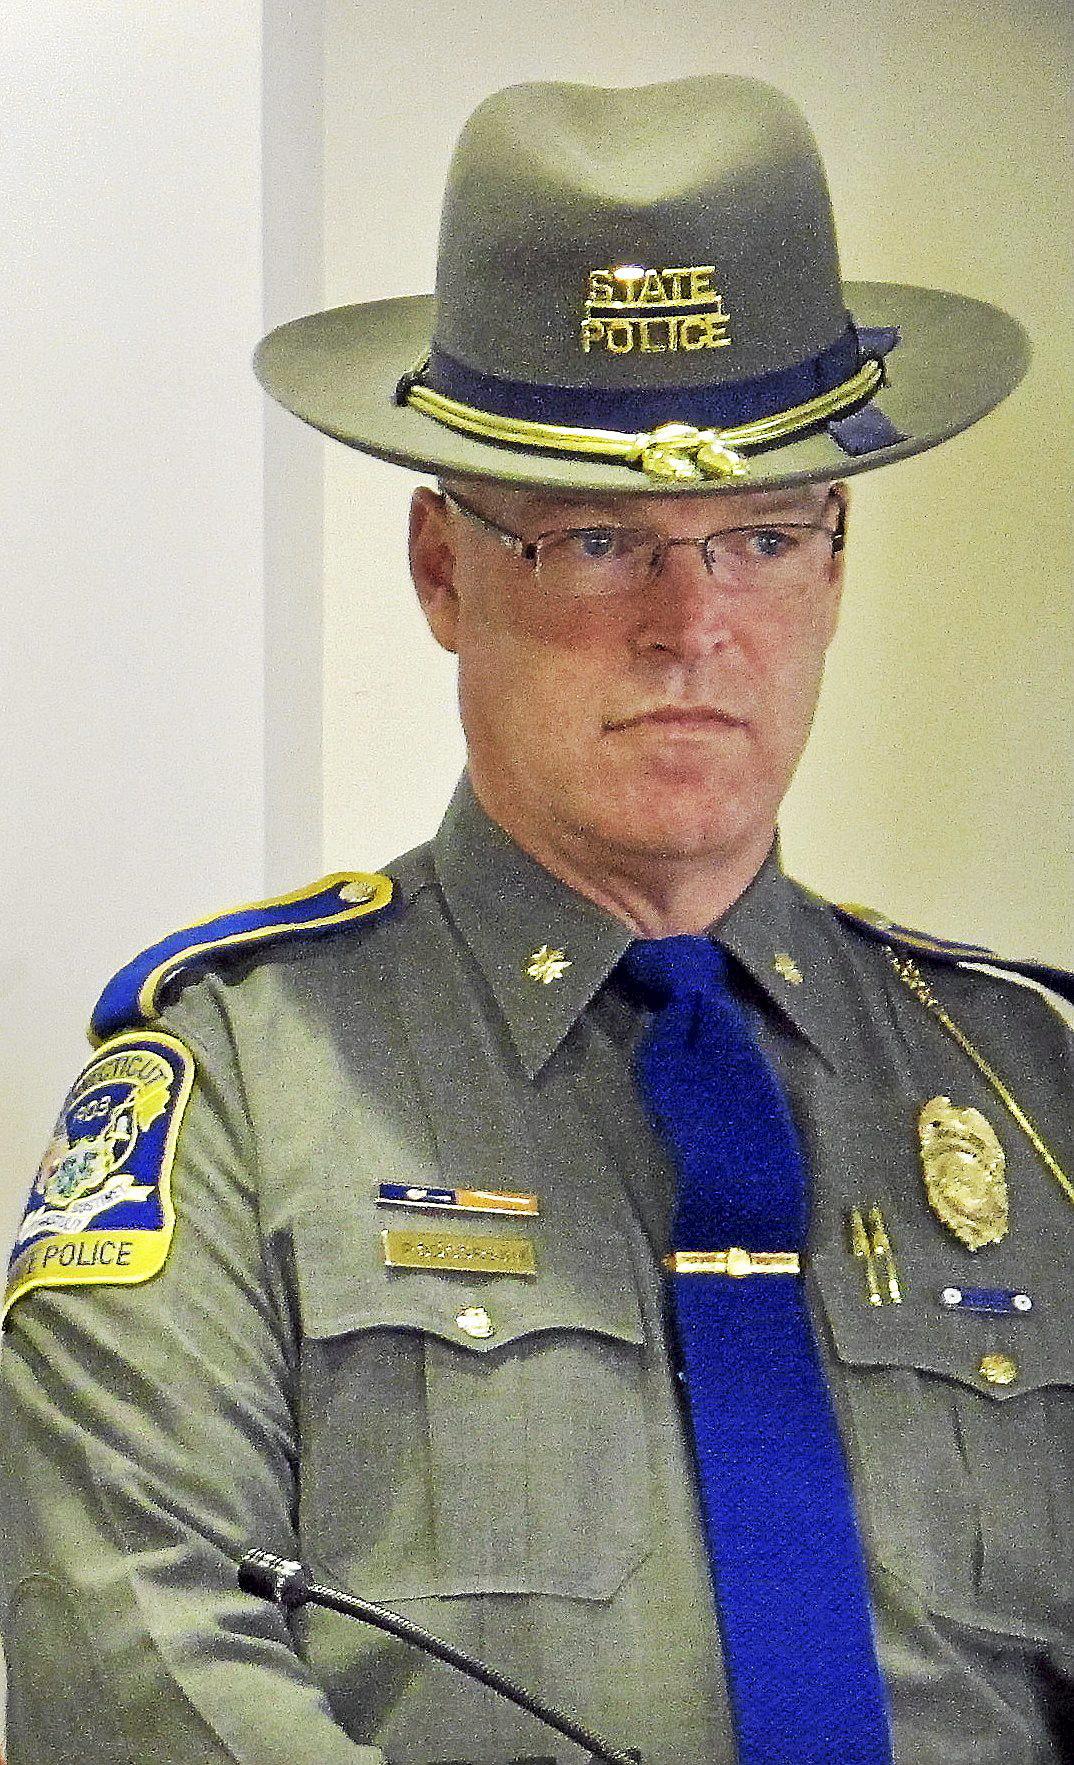 Connecticut State Police Major William Podgorski Dies